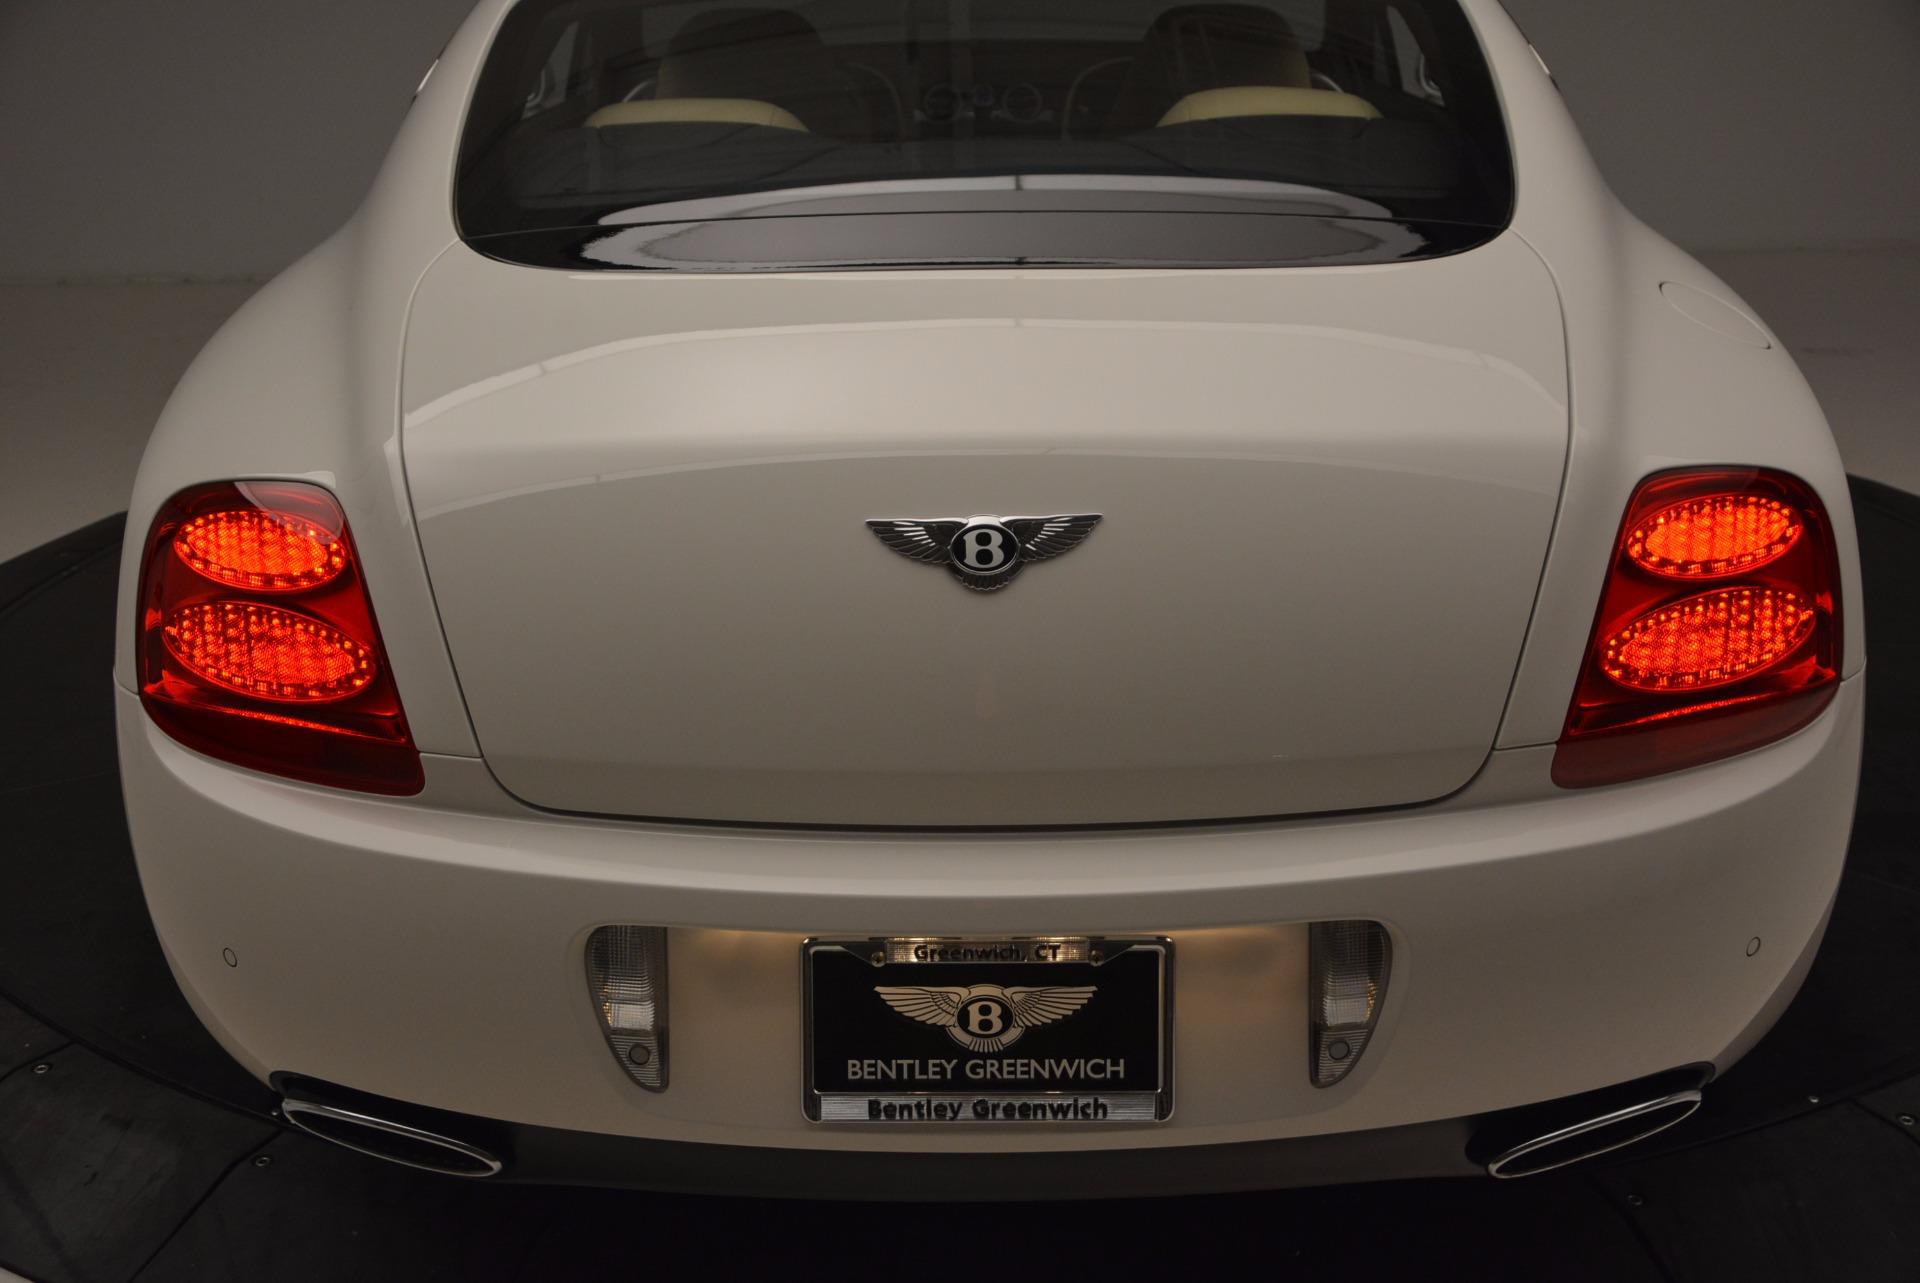 Used 2008 Bentley Continental GT Speed For Sale In Westport, CT 1552_p28